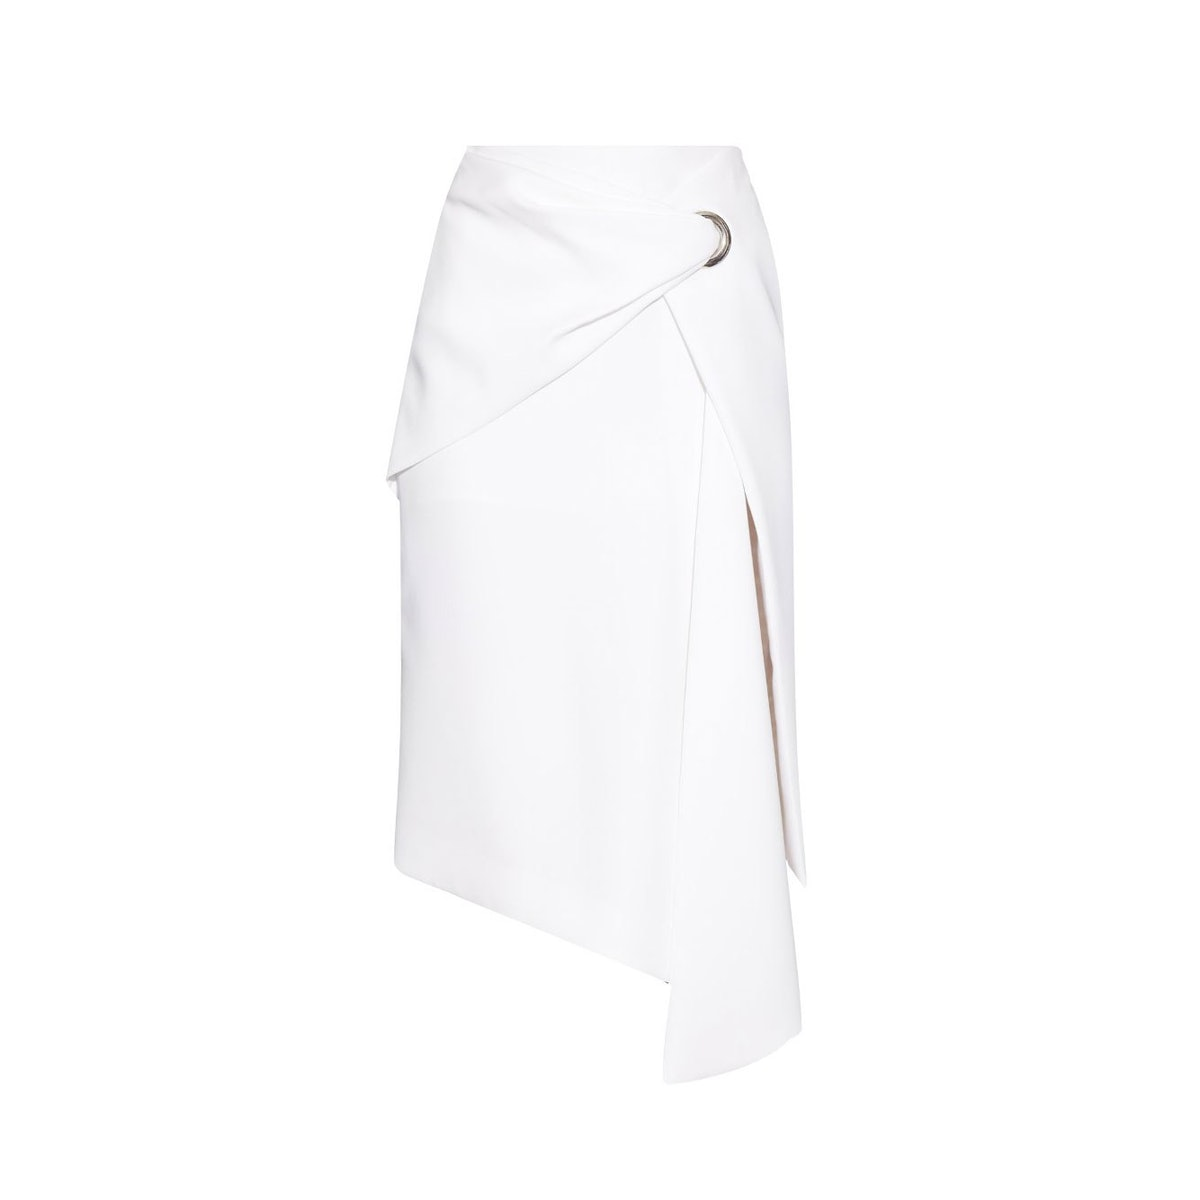 Balenciaga-skirt-1285-matchesfashion.com_.jpg